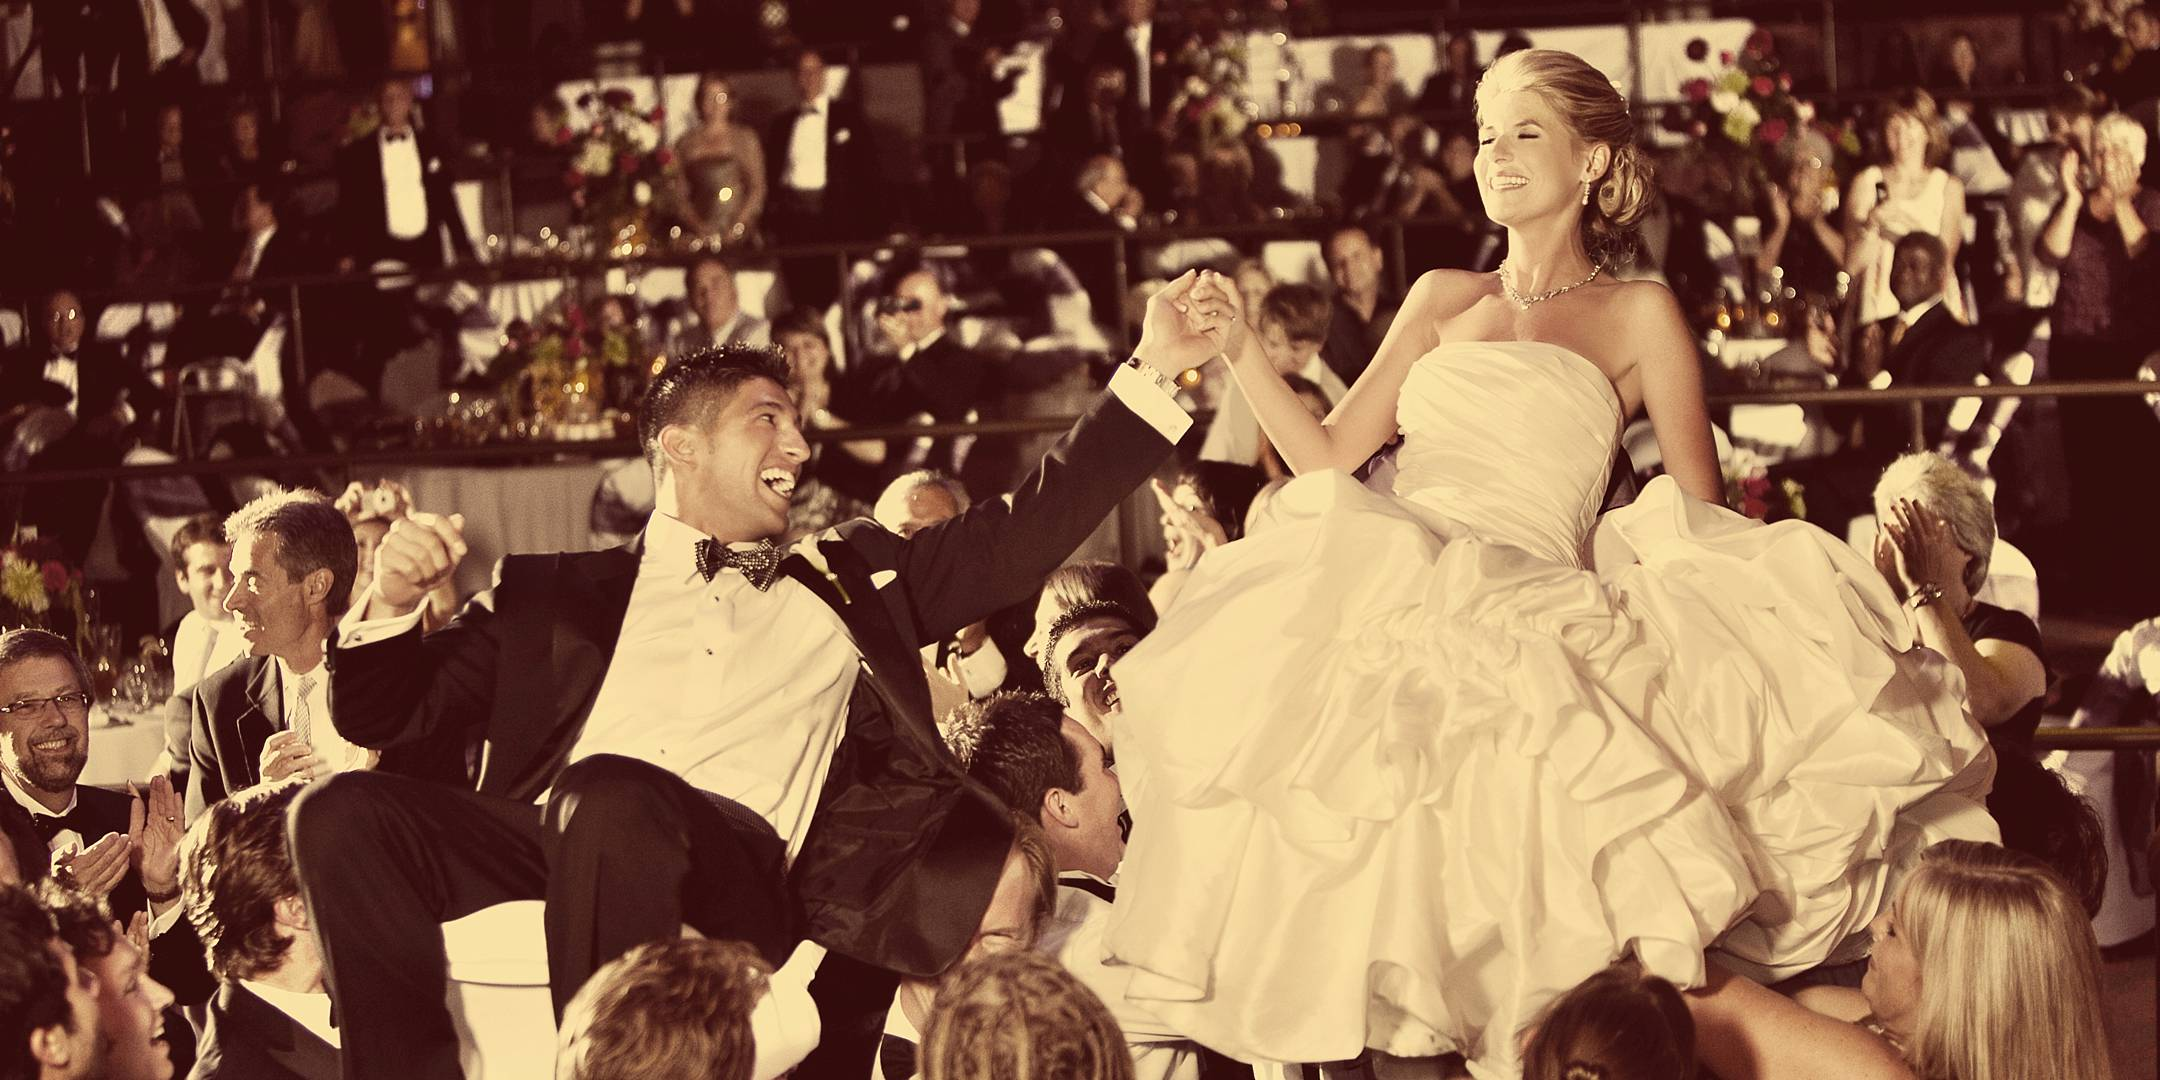 schmidt-photo-wedding-photography-chicago_2310